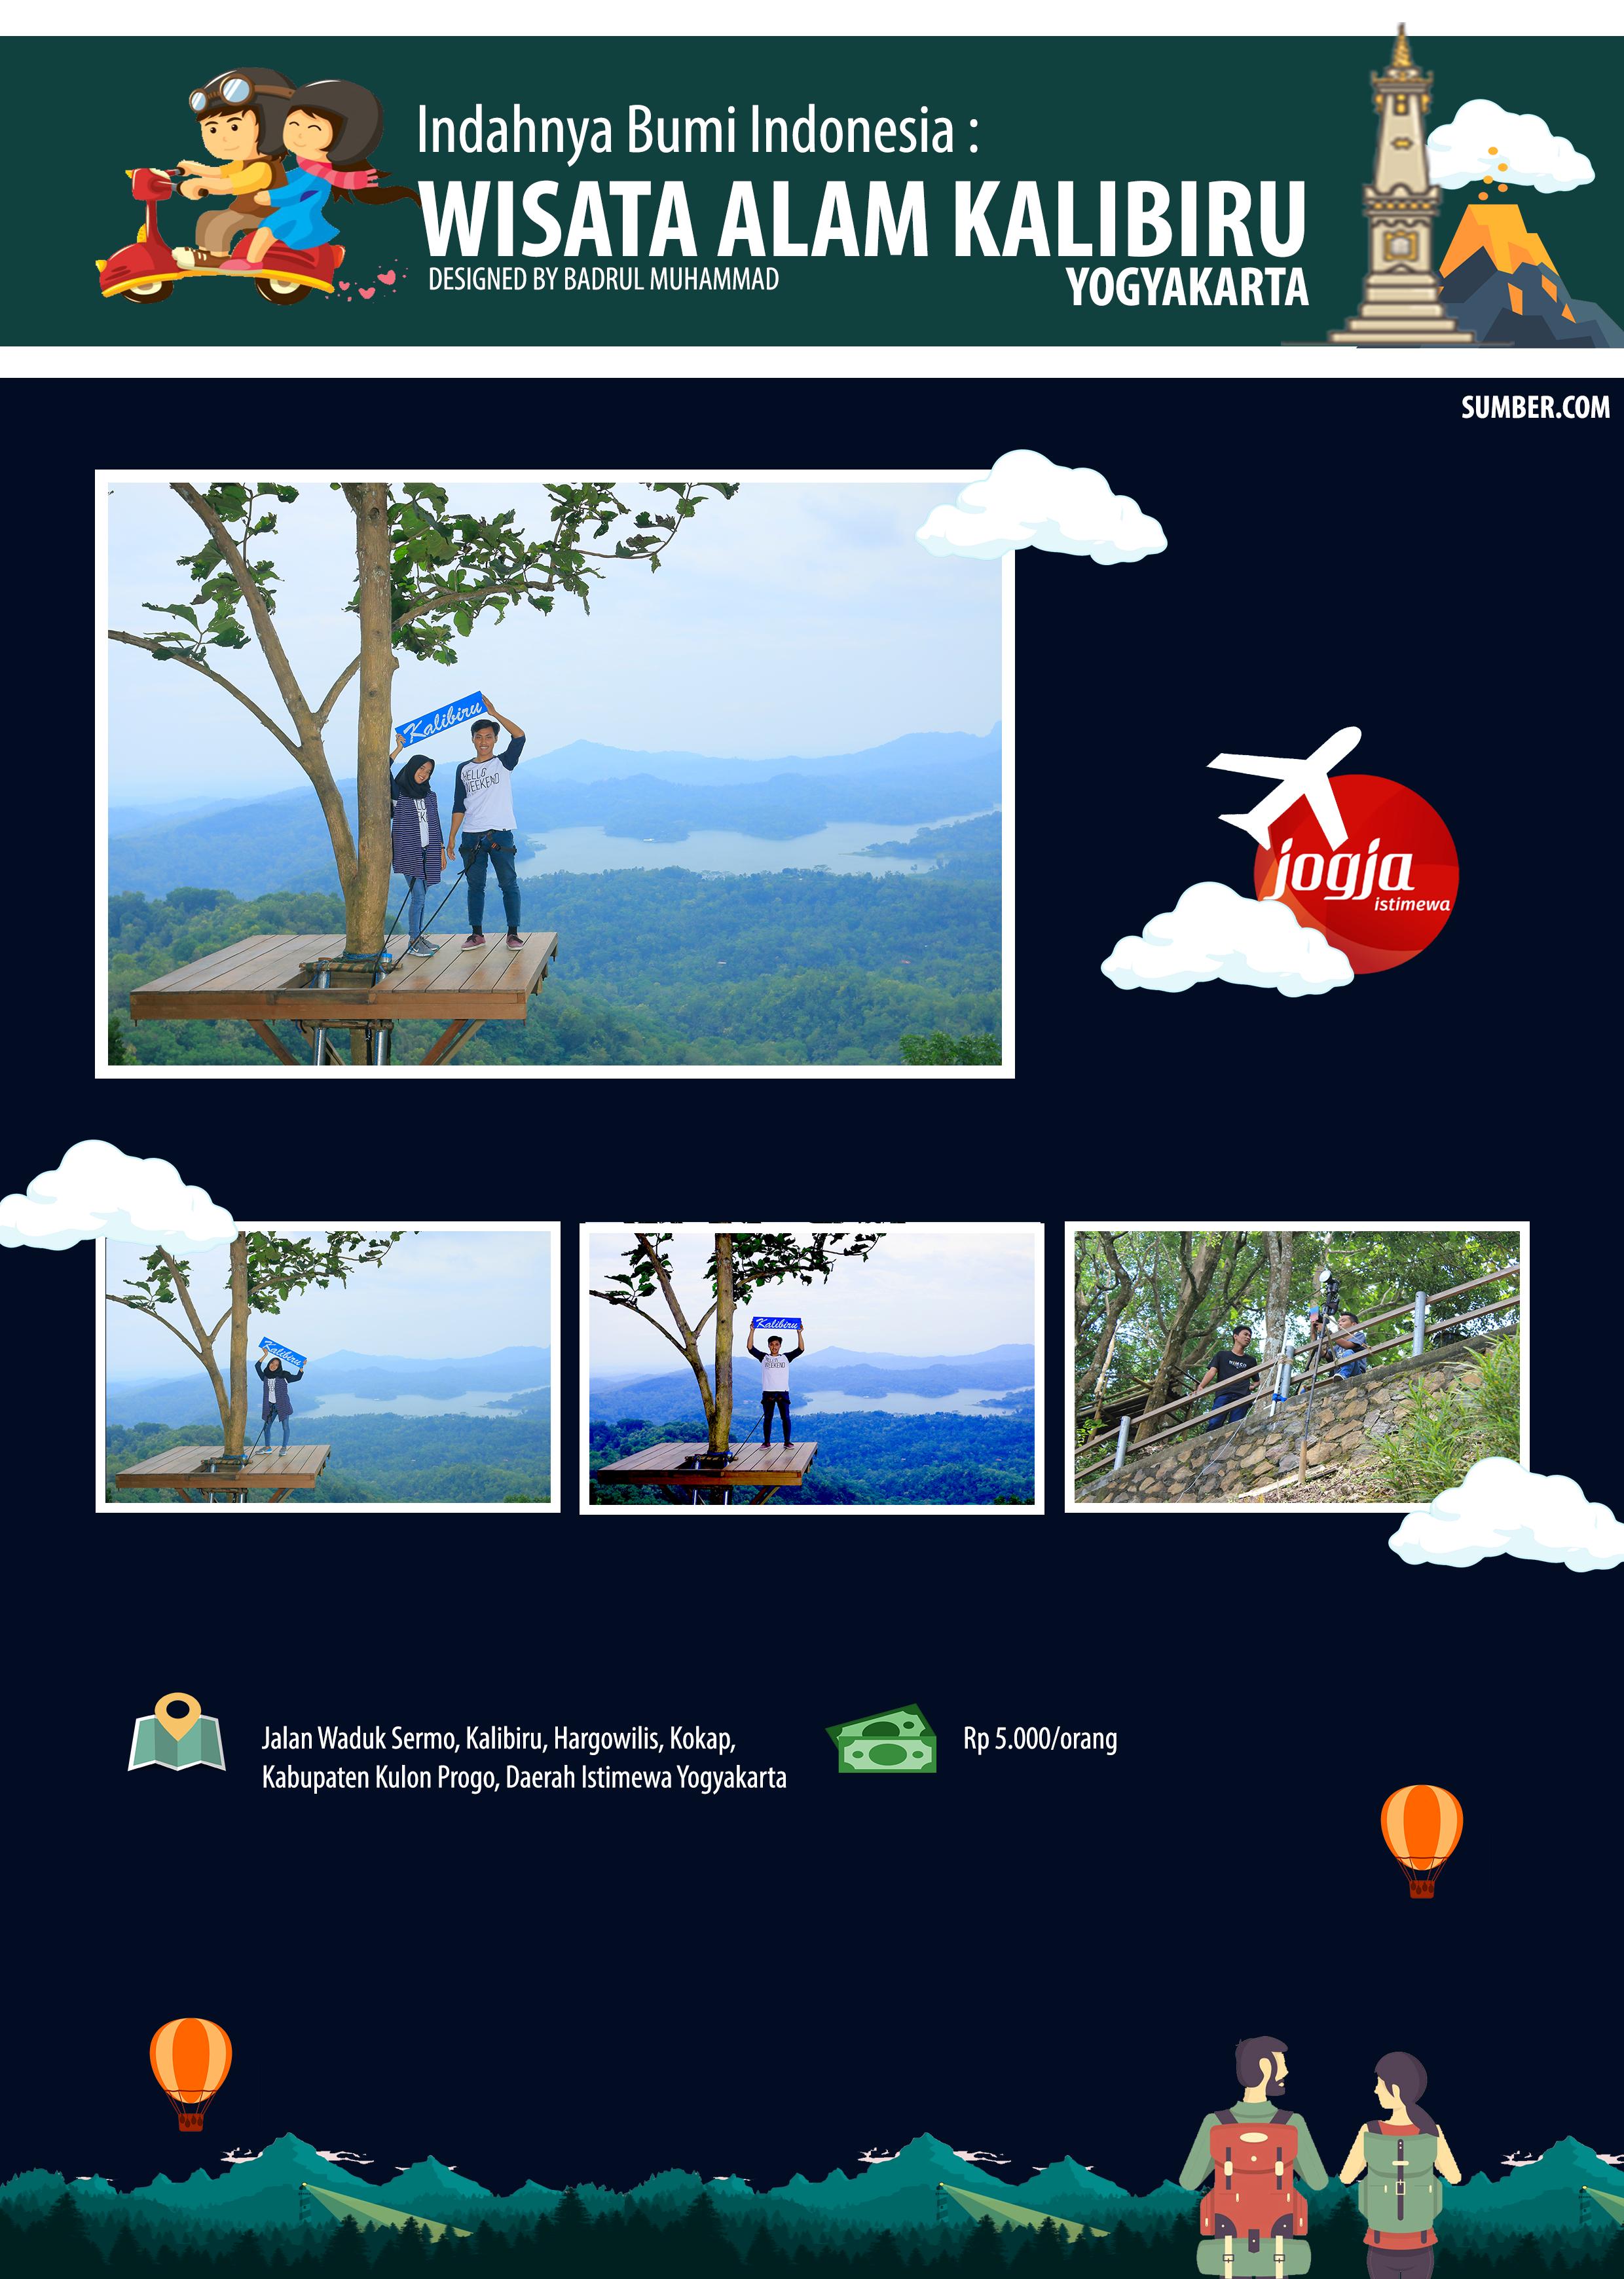 indahnya bumi indonesia